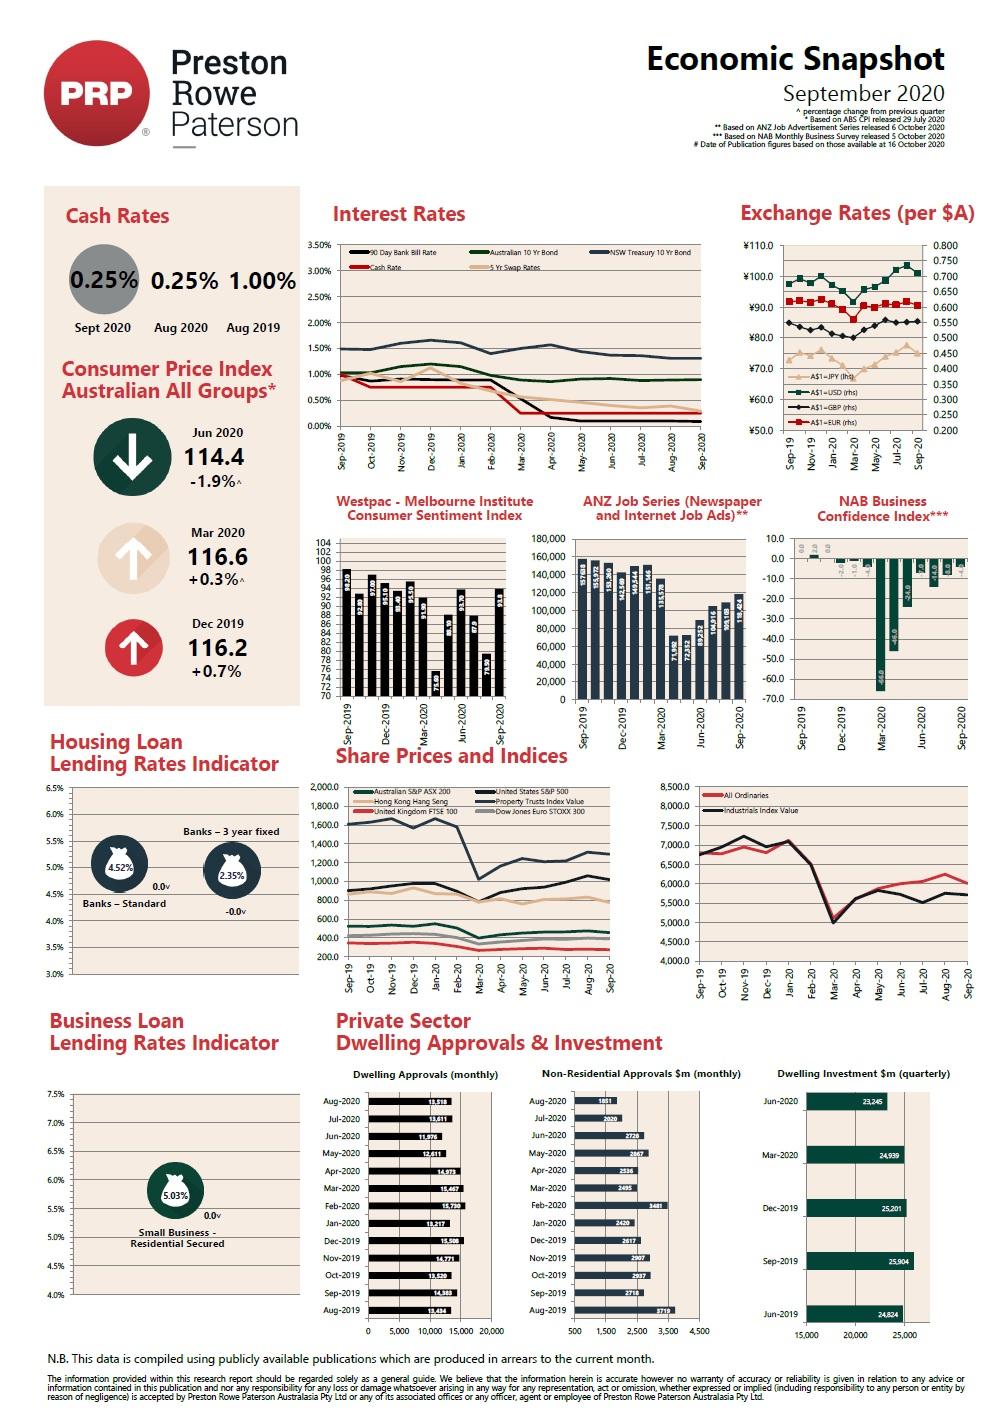 Economic Snapshot September 2020